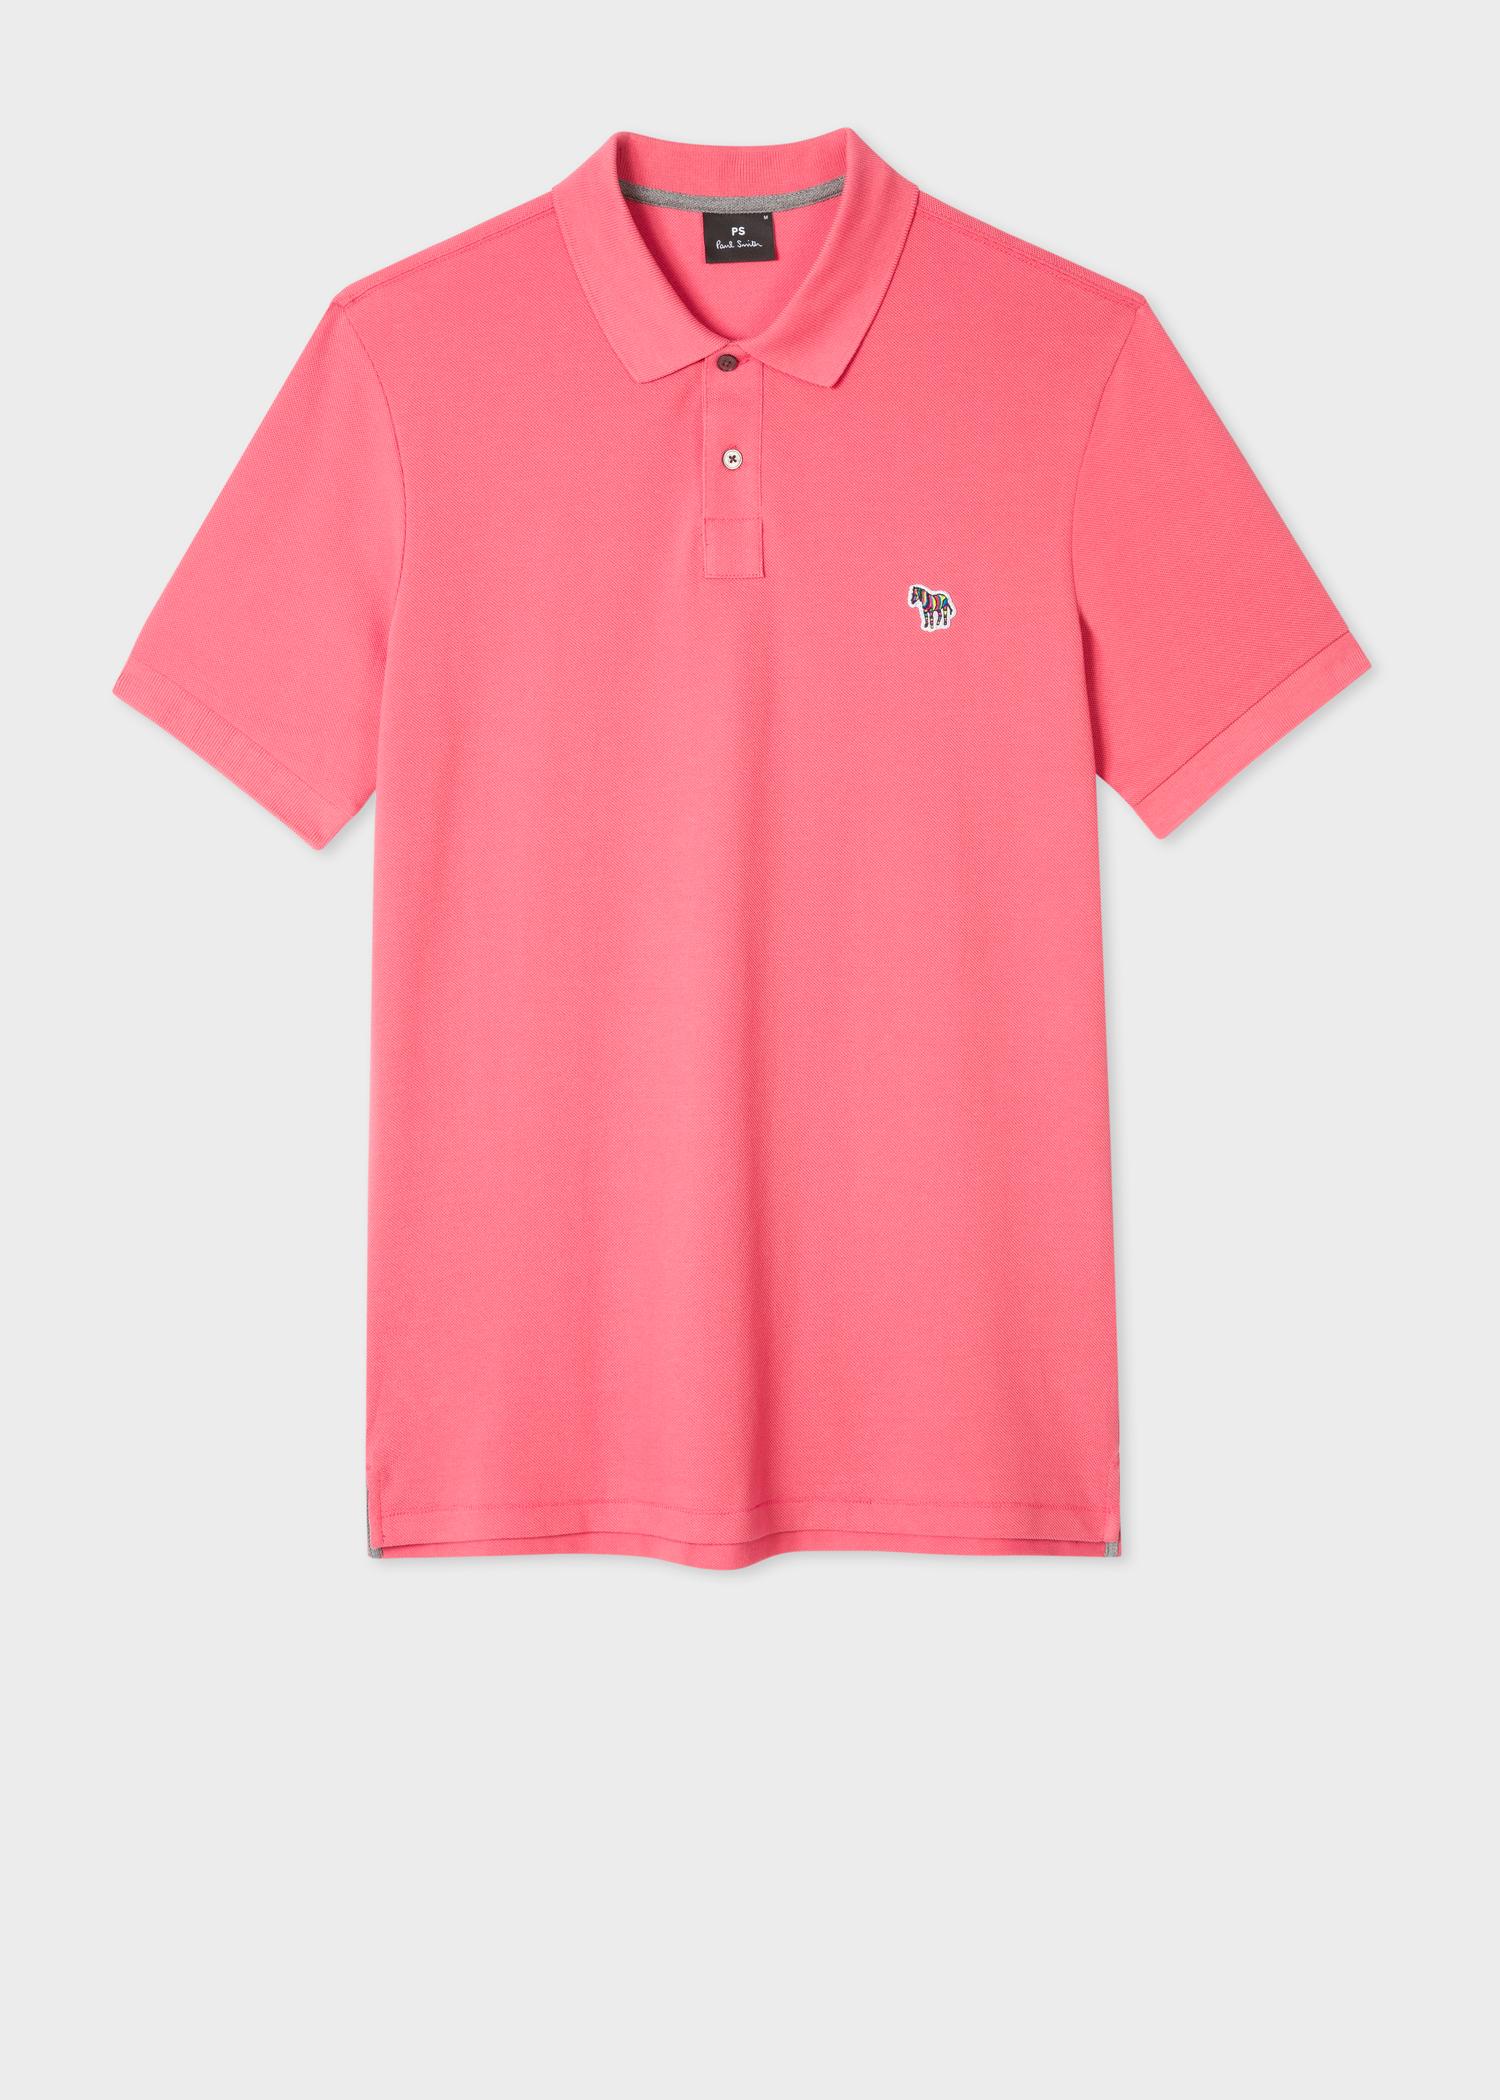 5a964346 Front View - Men's Pink Organic Cotton-Piqué Zebra Logo Polo Shirt Paul  Smith